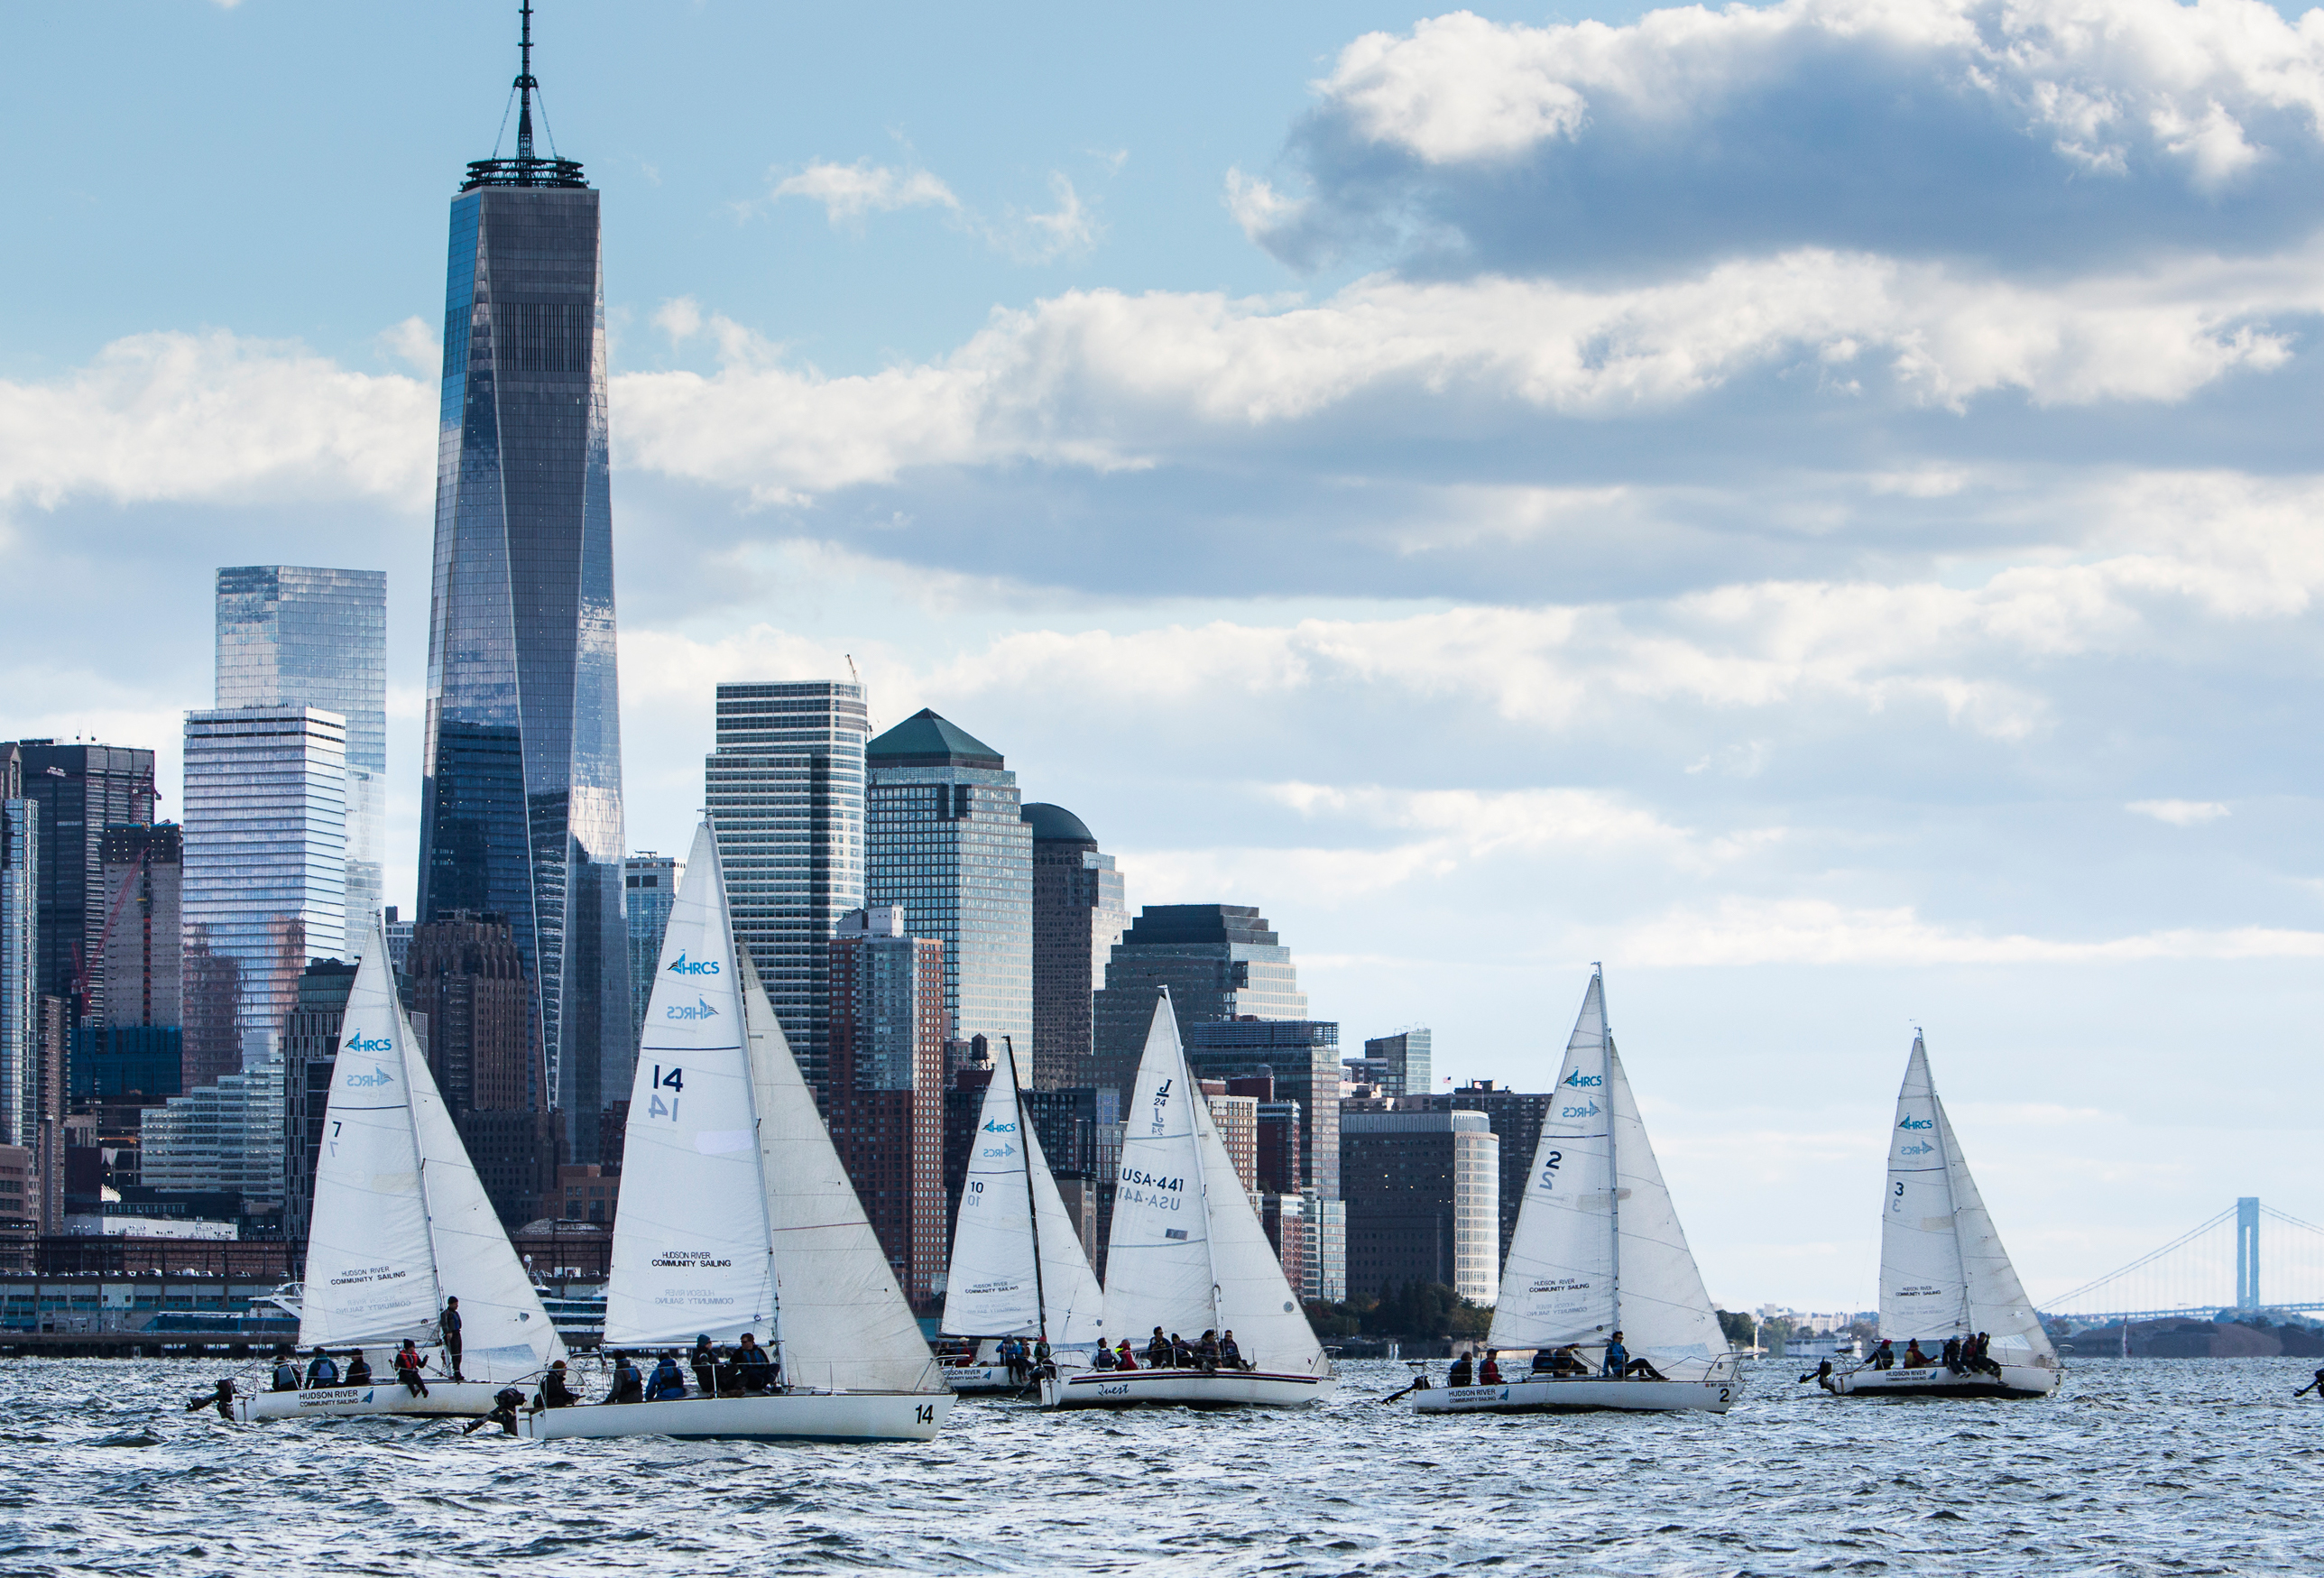 fleet-with-skyline